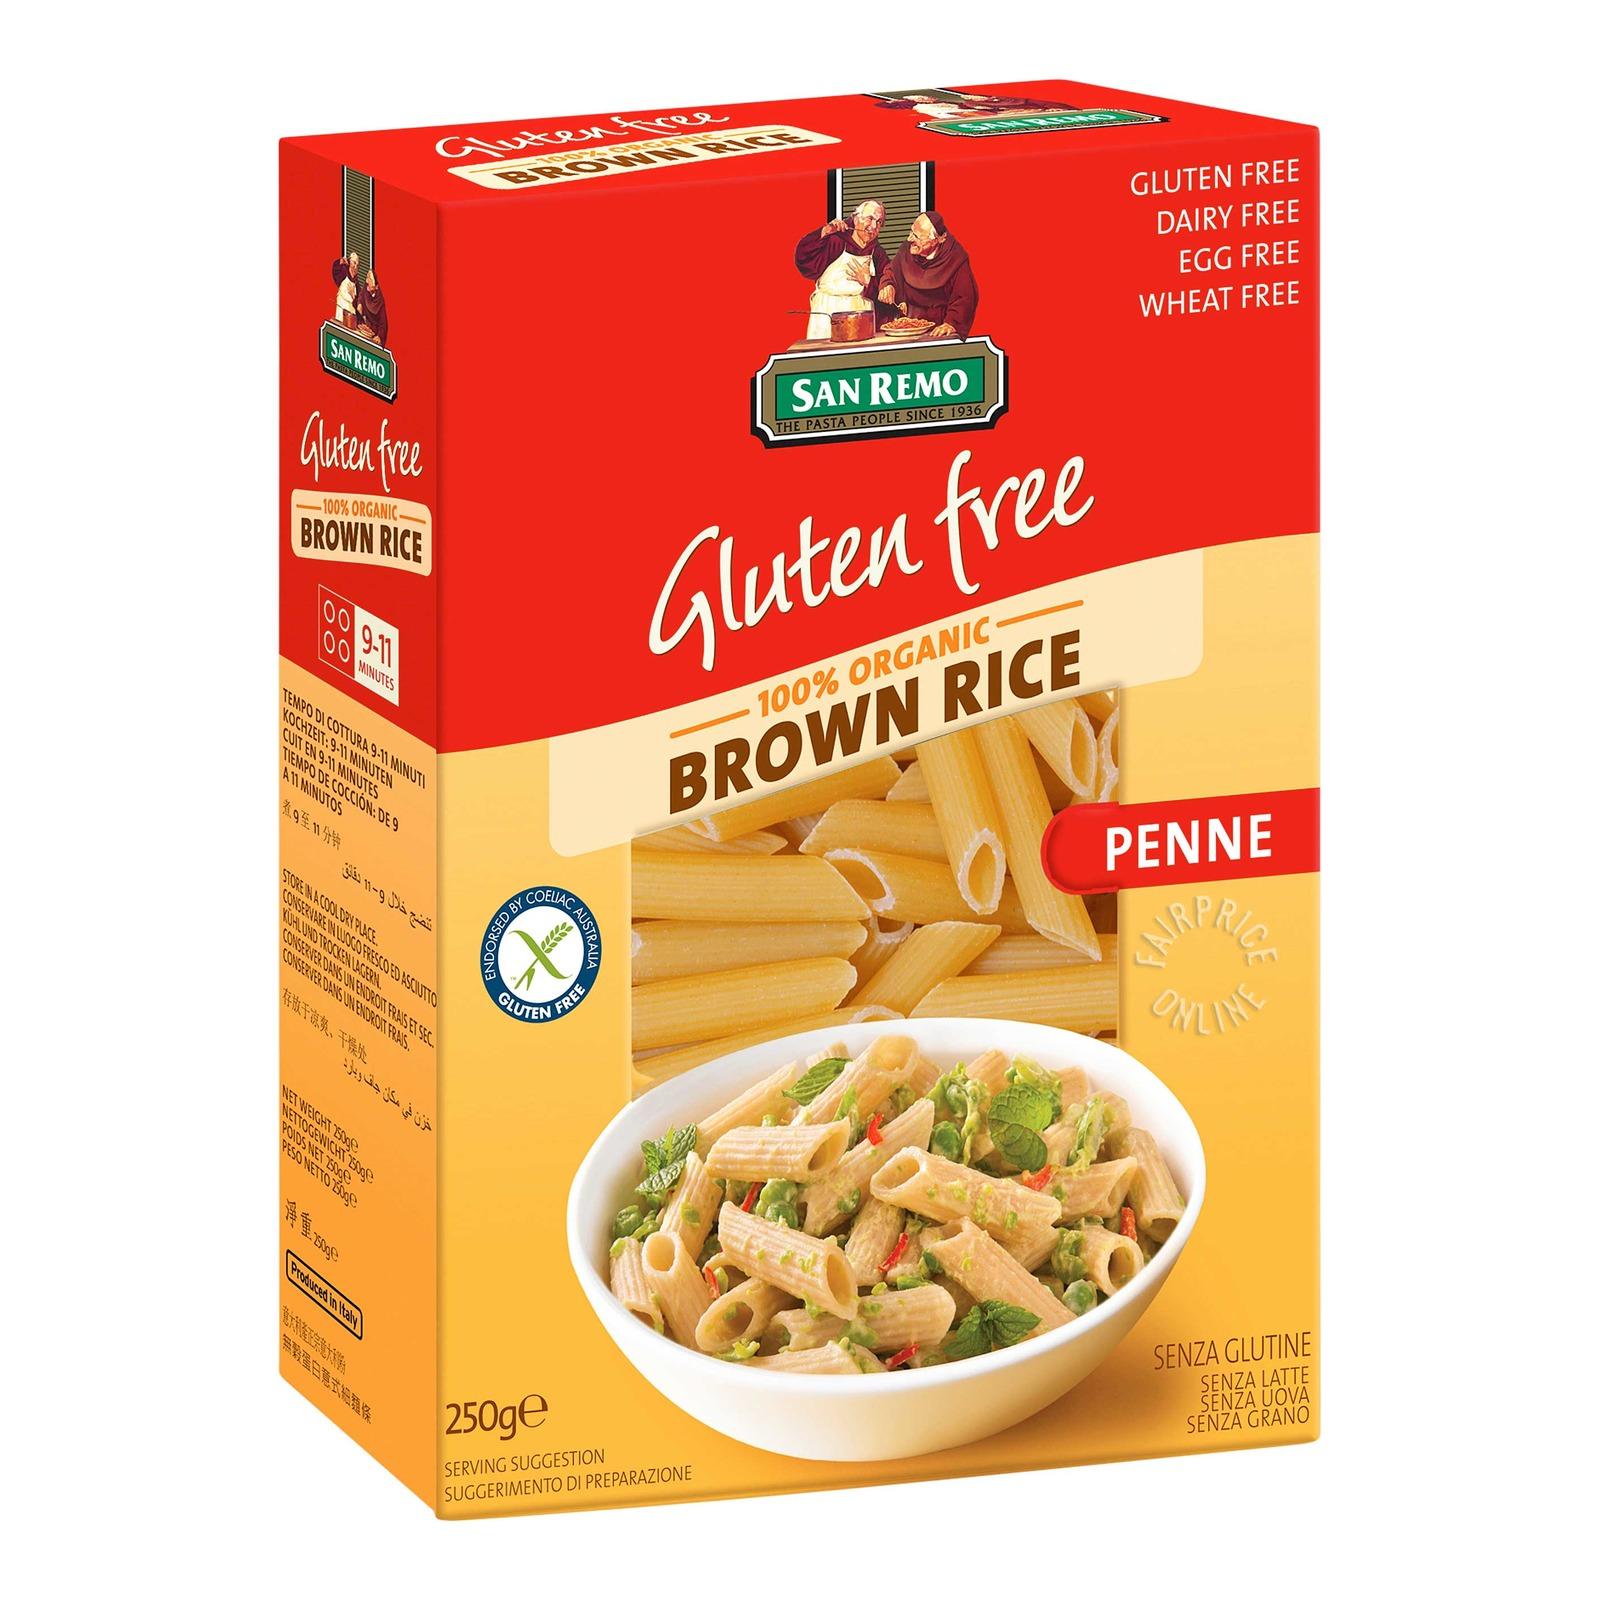 San Remo Organic Brown Rice Pasta - Penne